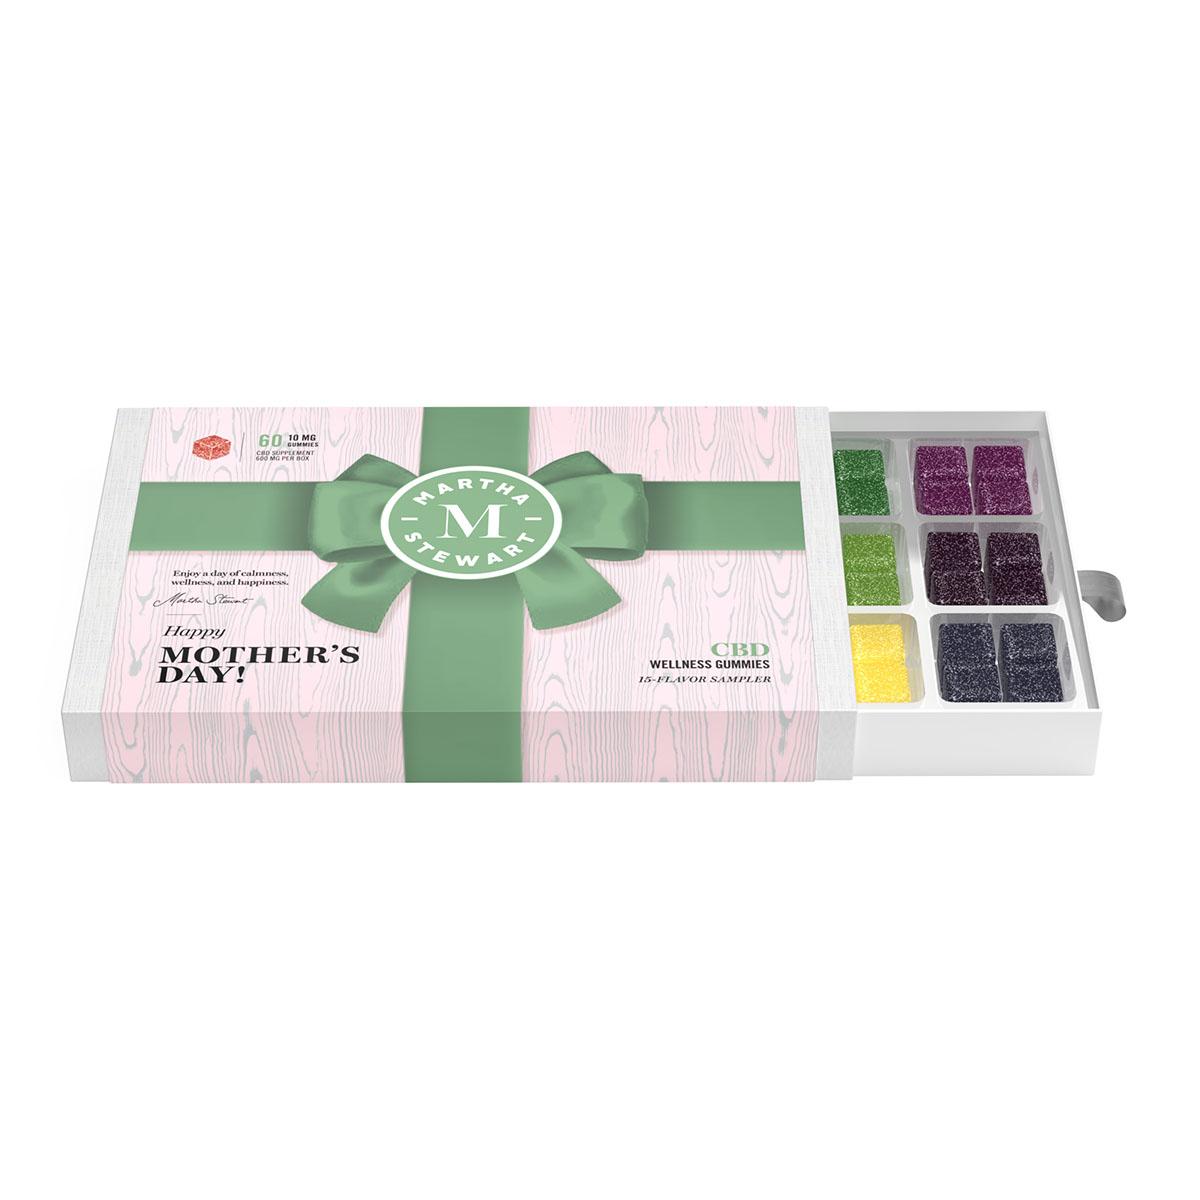 Martha Stewart CBD Wellness Gummies - Mothers Day Gift Box